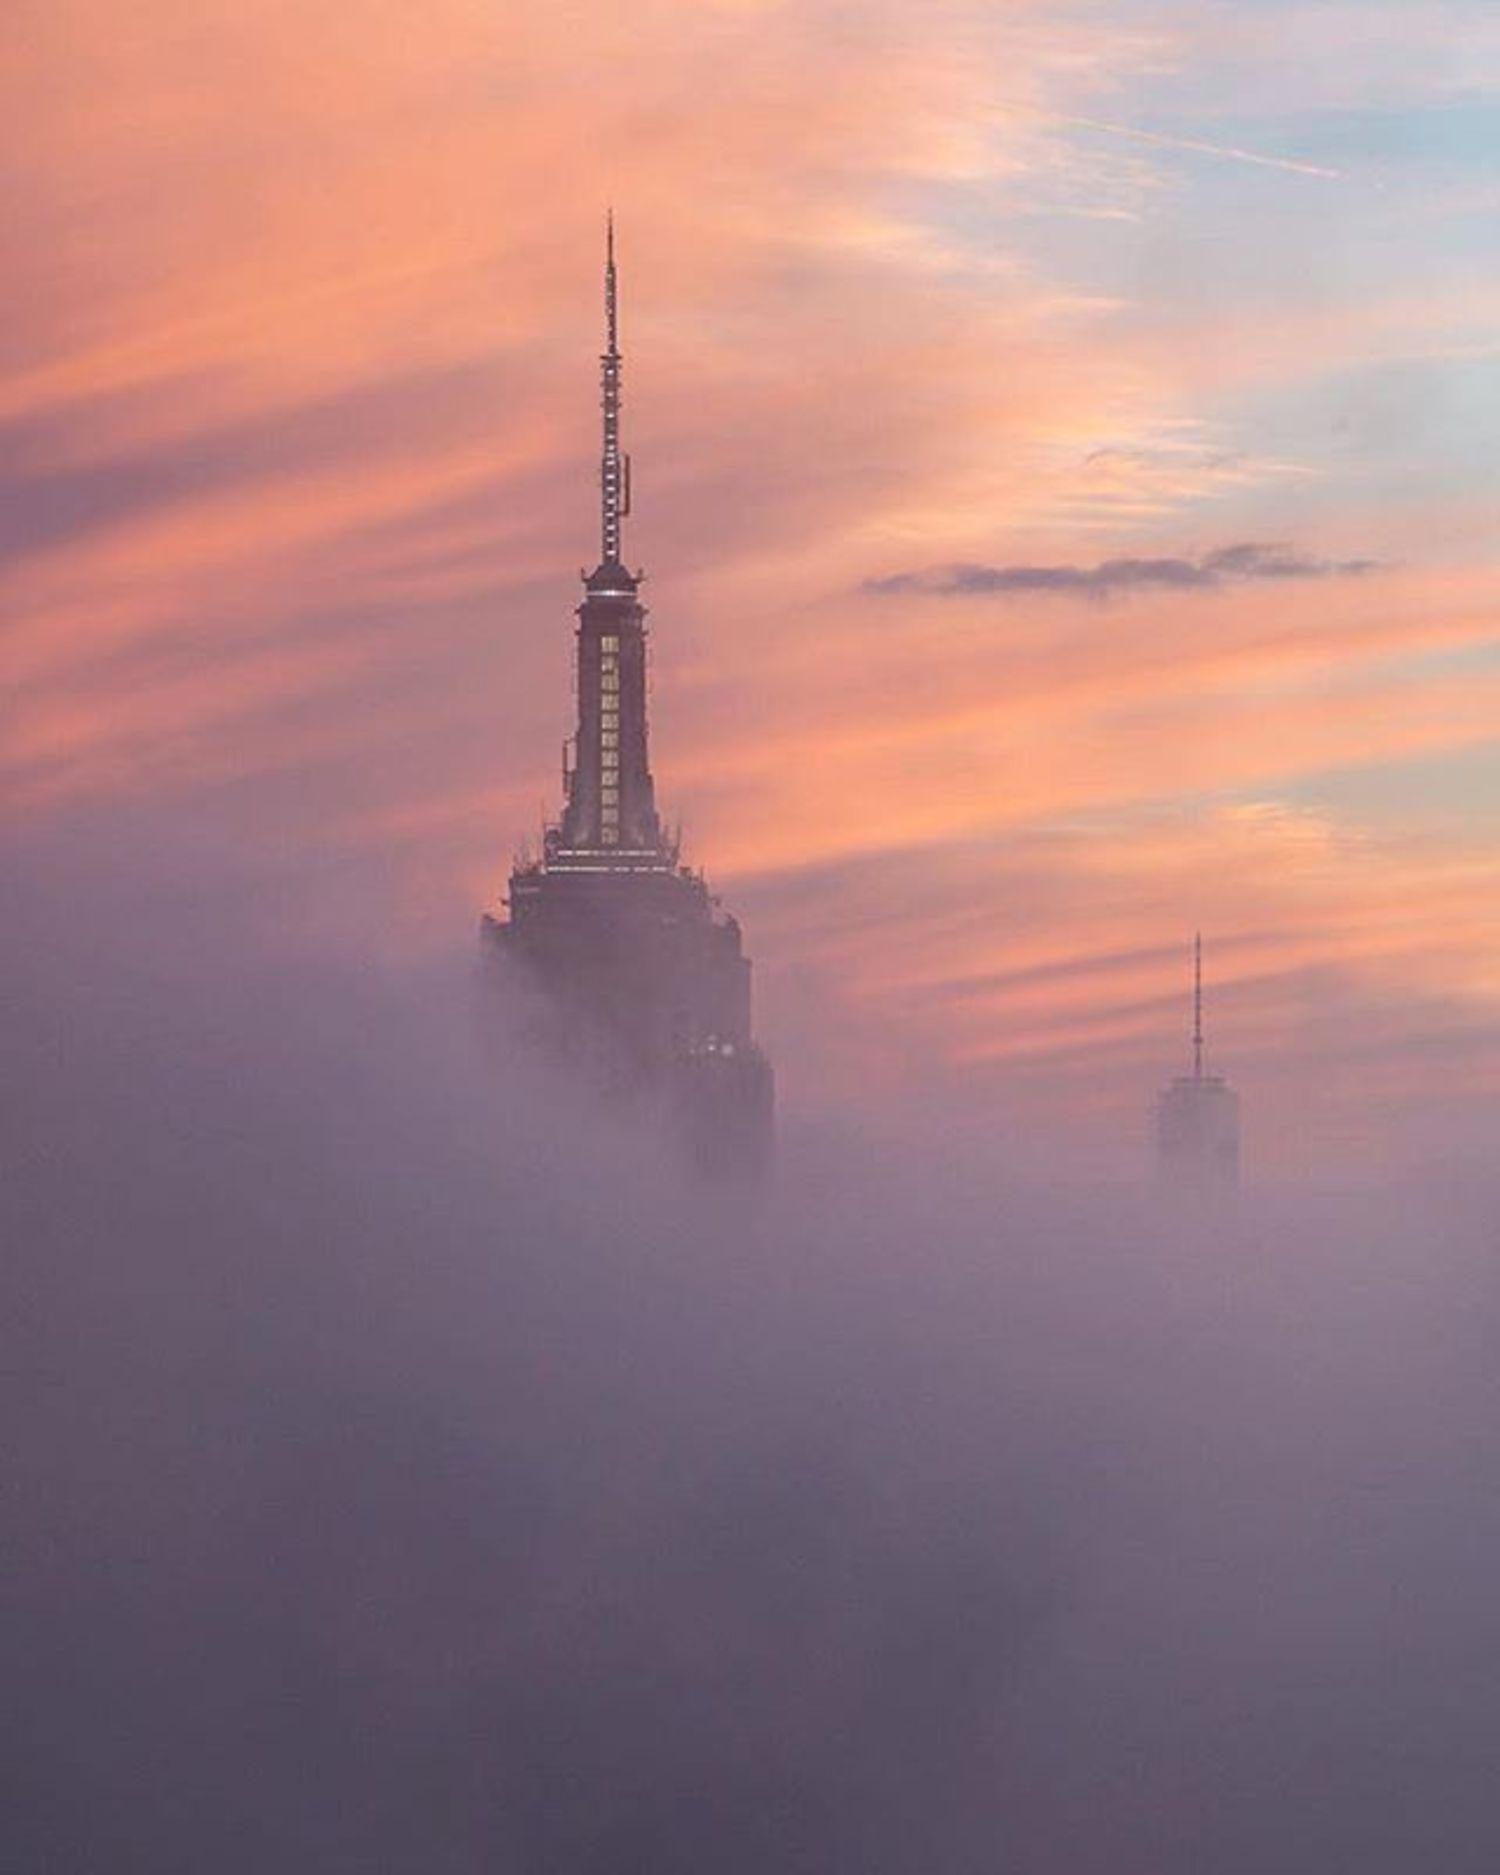 New York, New York. Photo via @johnnyyonkers #viewingnyc #newyorkcity #newyork